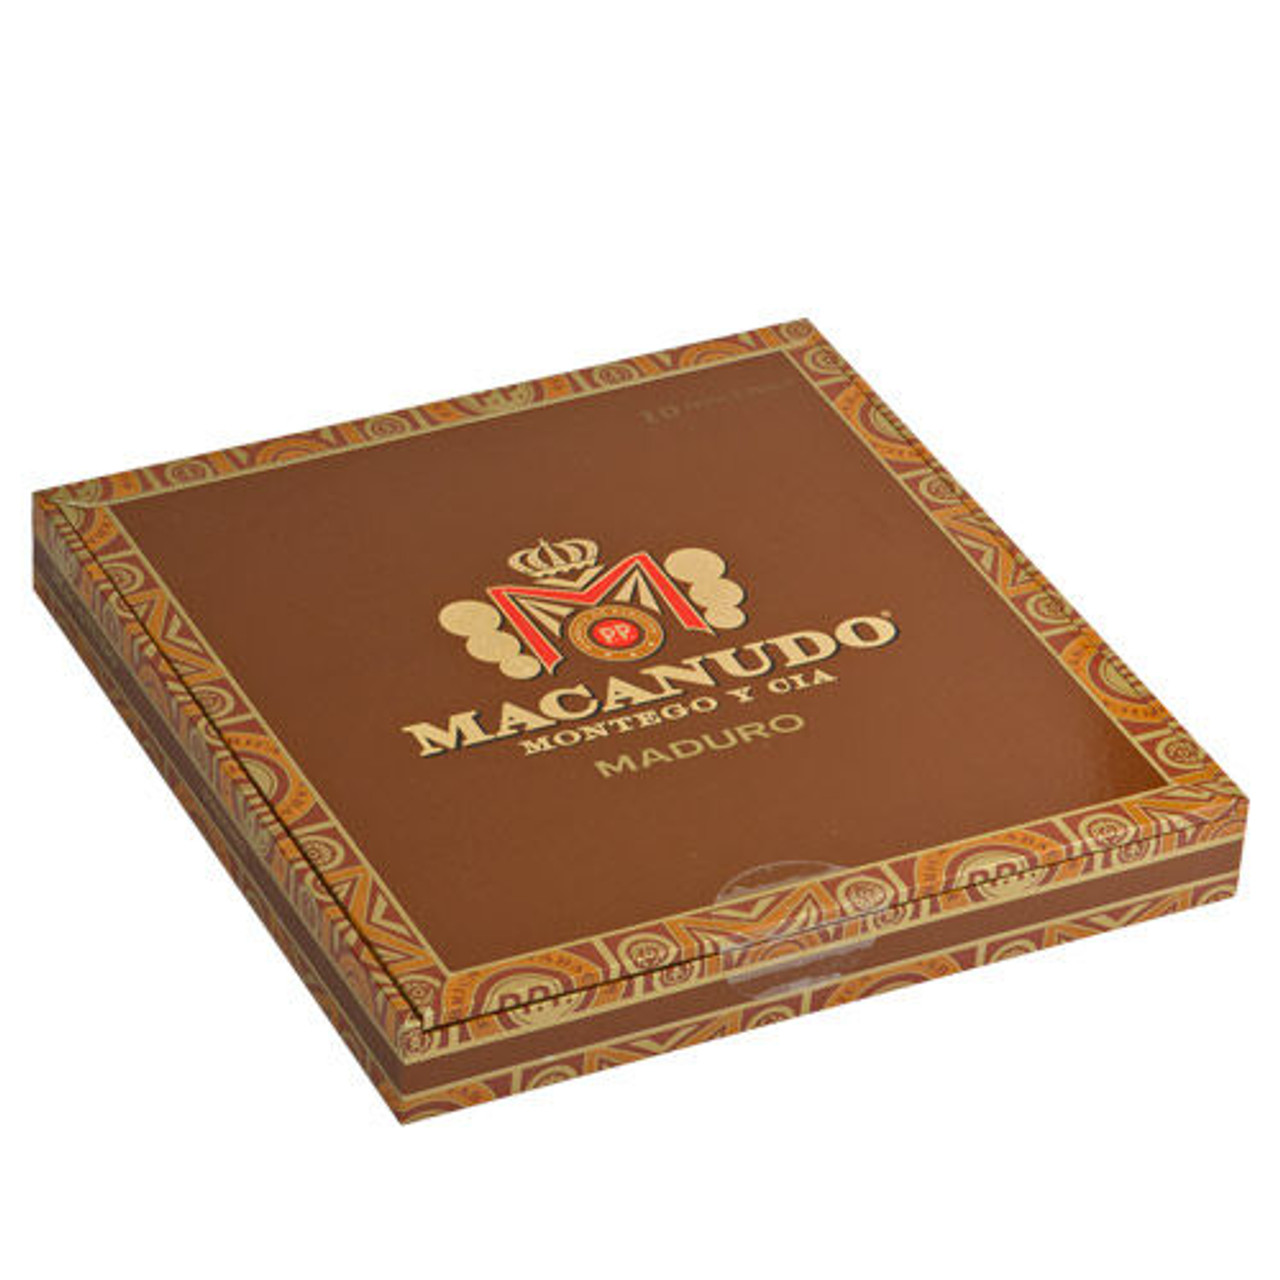 Macanudo Ascot Maduro Cigars - single tin